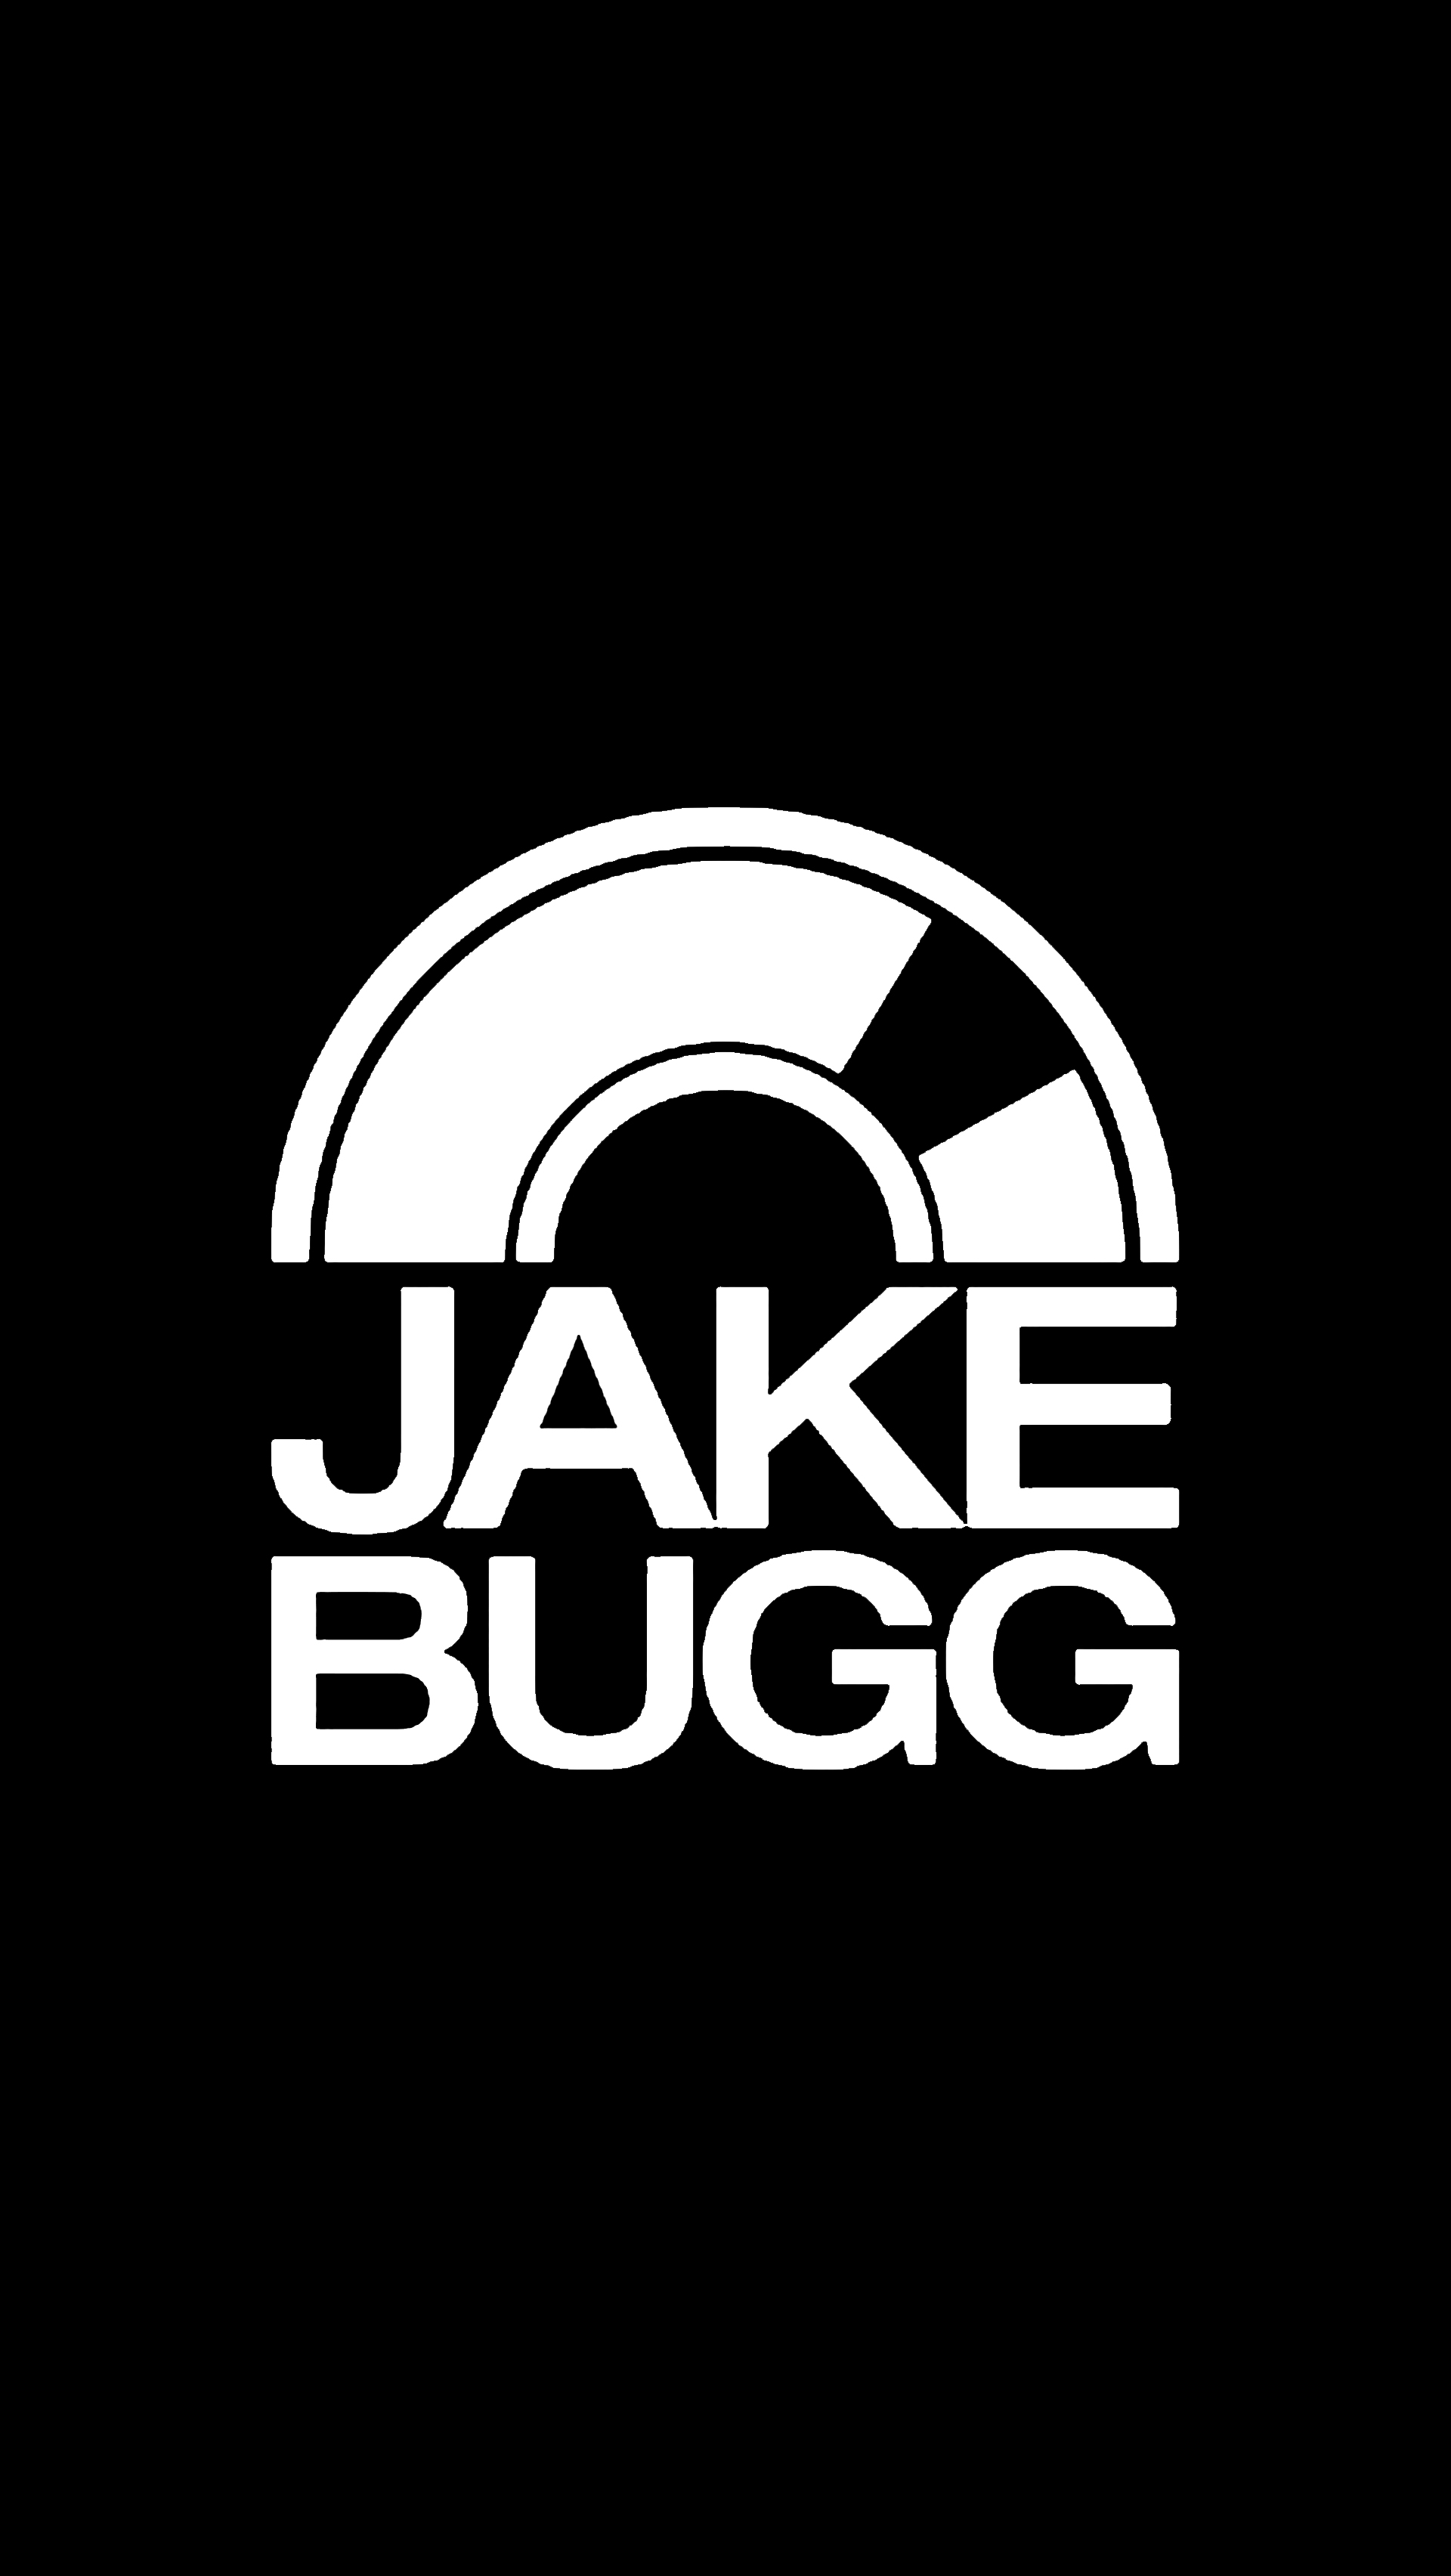 The Beatles Iphone 5 Wallpaper Jake Bugg